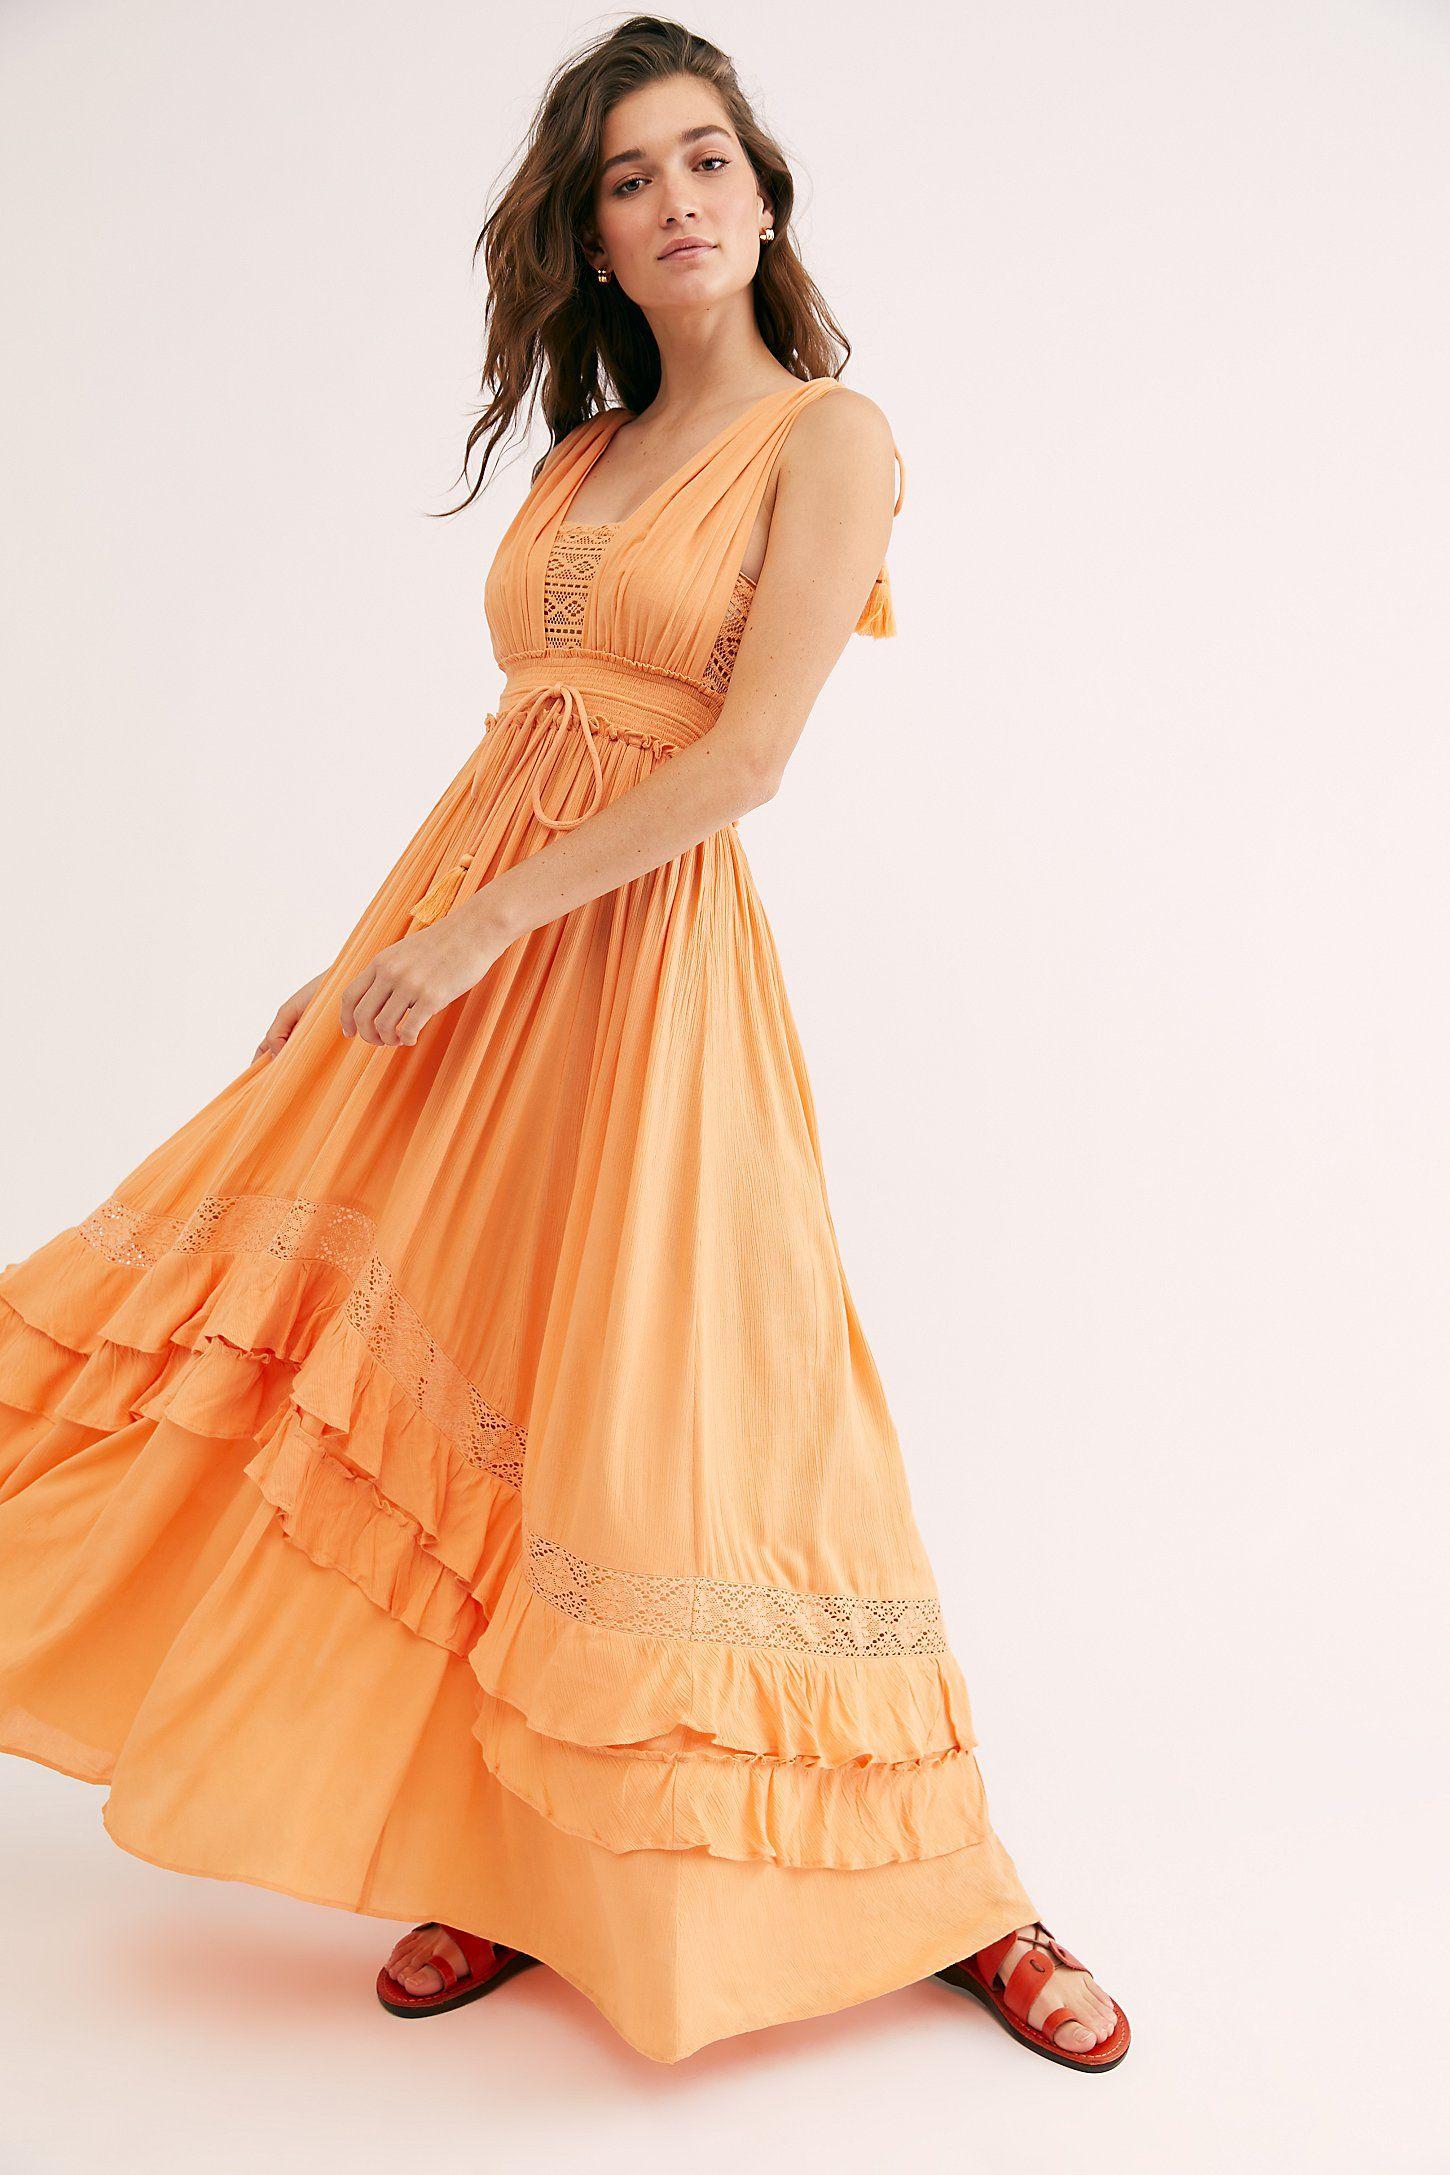 Modern Turtleneck Top Maxi Dress Casual Dress Outfits Endless Summer Collection [ 2175 x 1450 Pixel ]